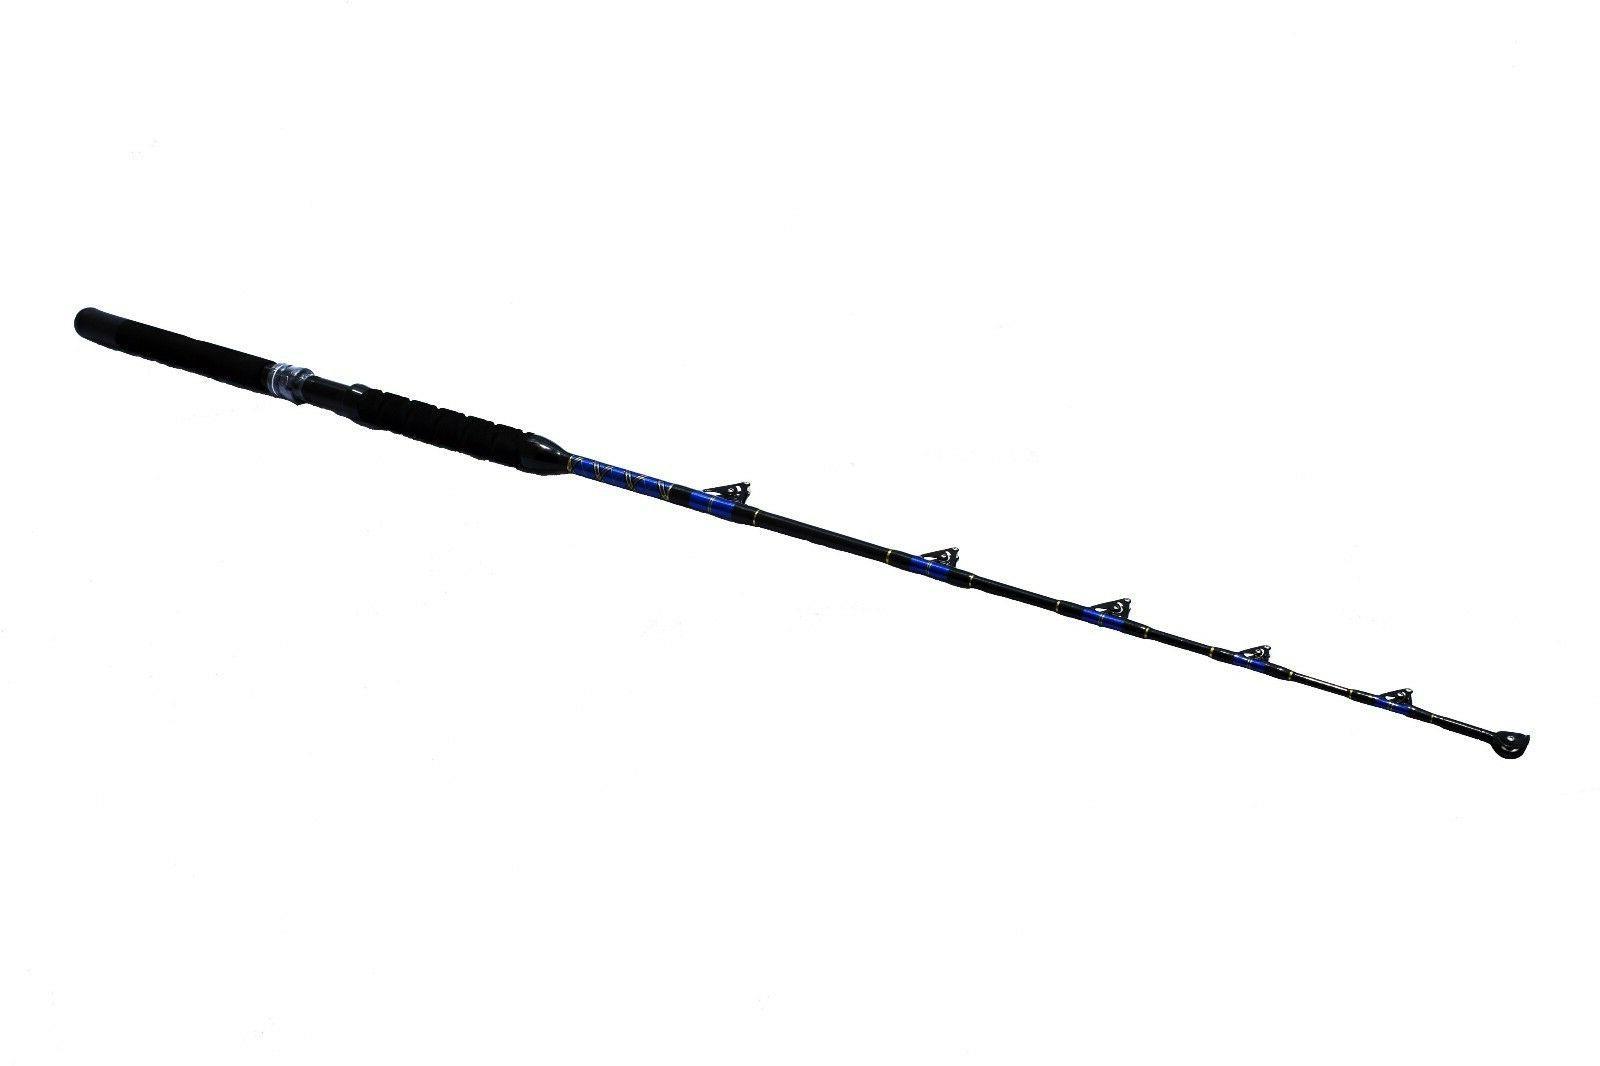 100-120 lb. All Roller Big Game Fishing